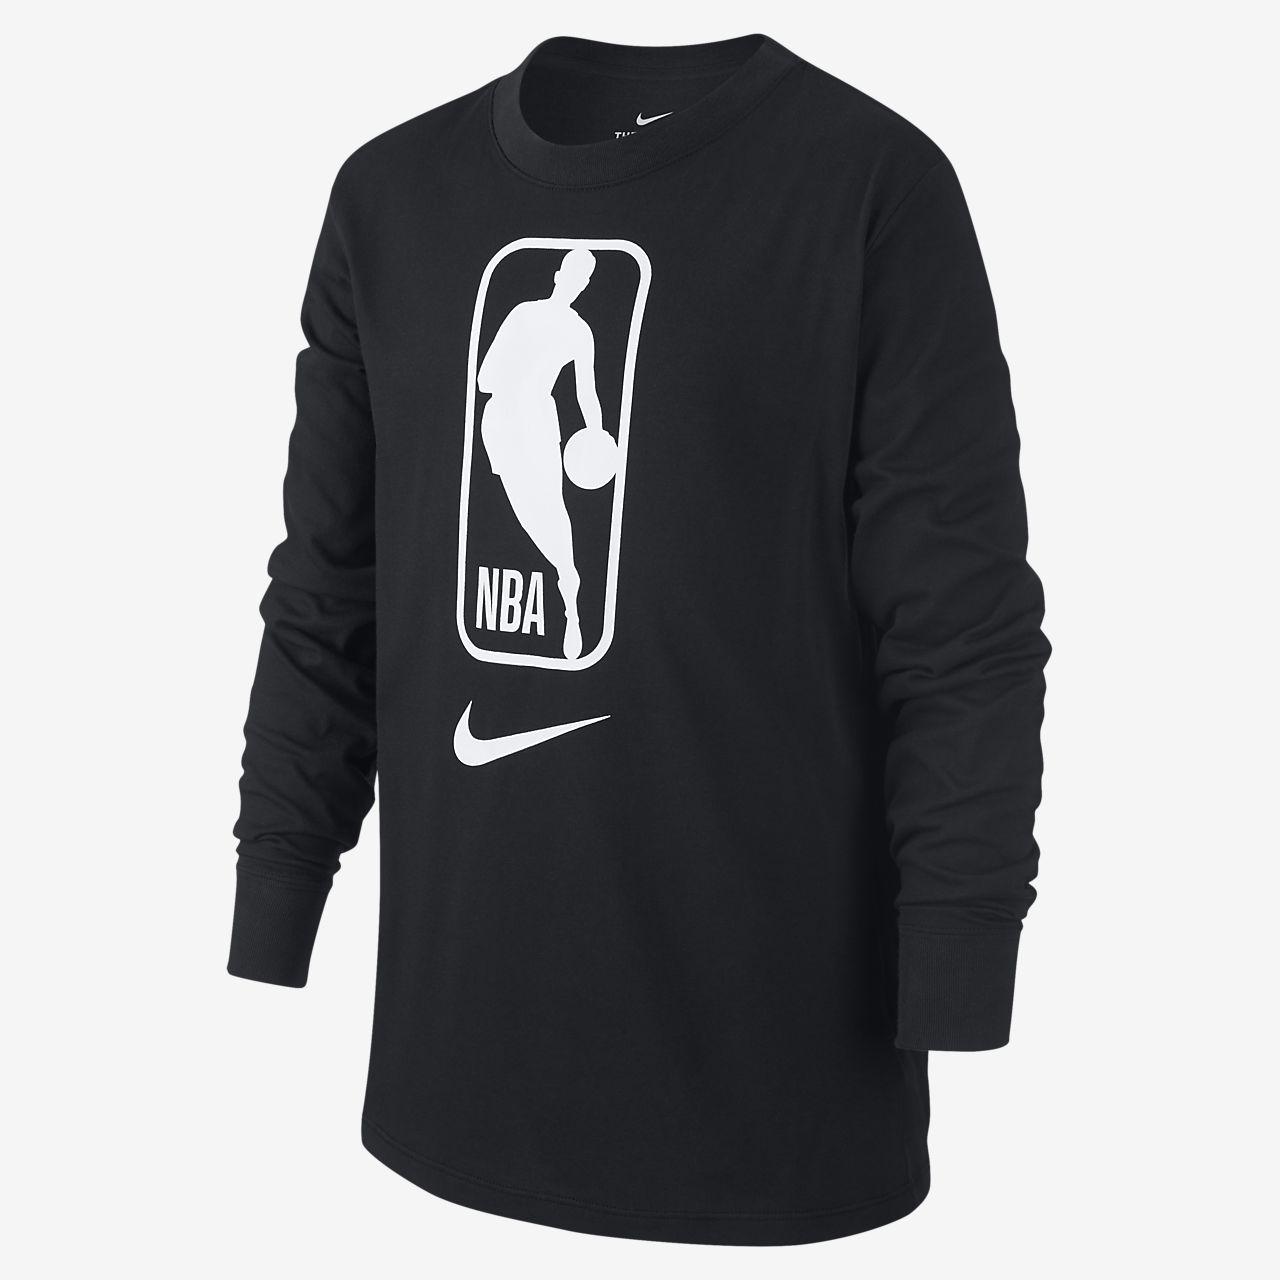 Nike Dri-FIT Camiseta de la NBA de manga larga - Niño/a